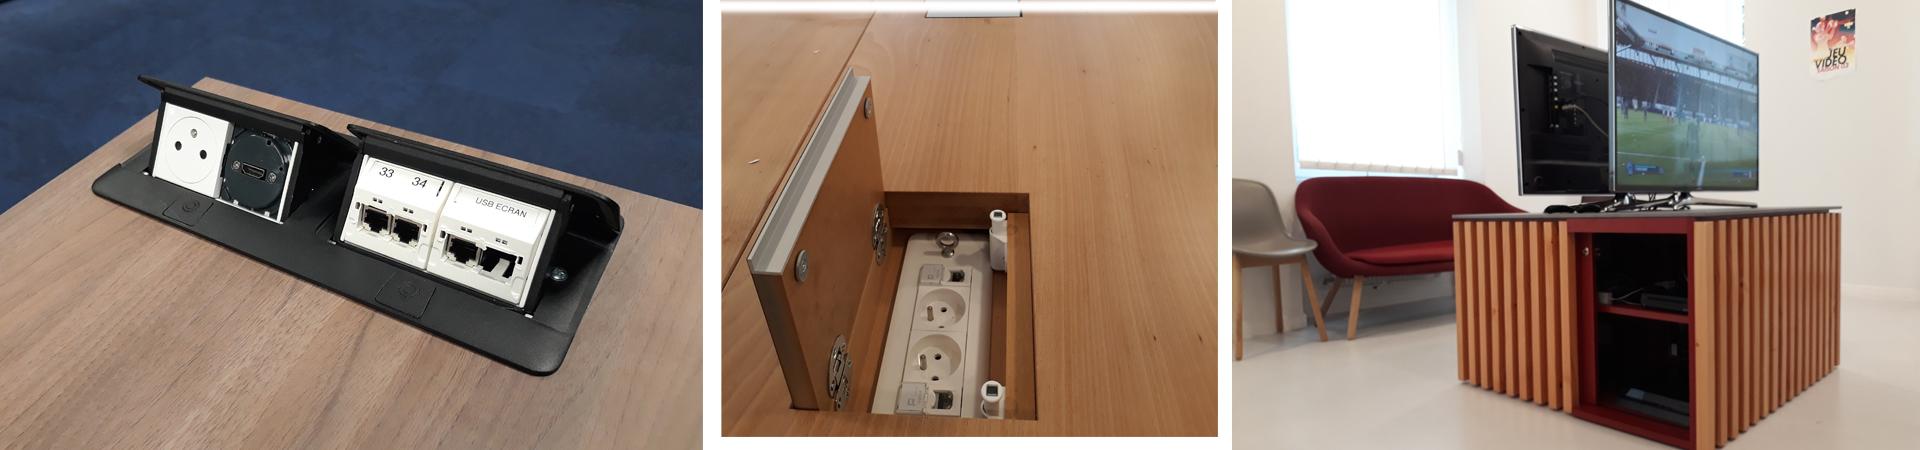 Boitier connectique, meuble audiovisuel